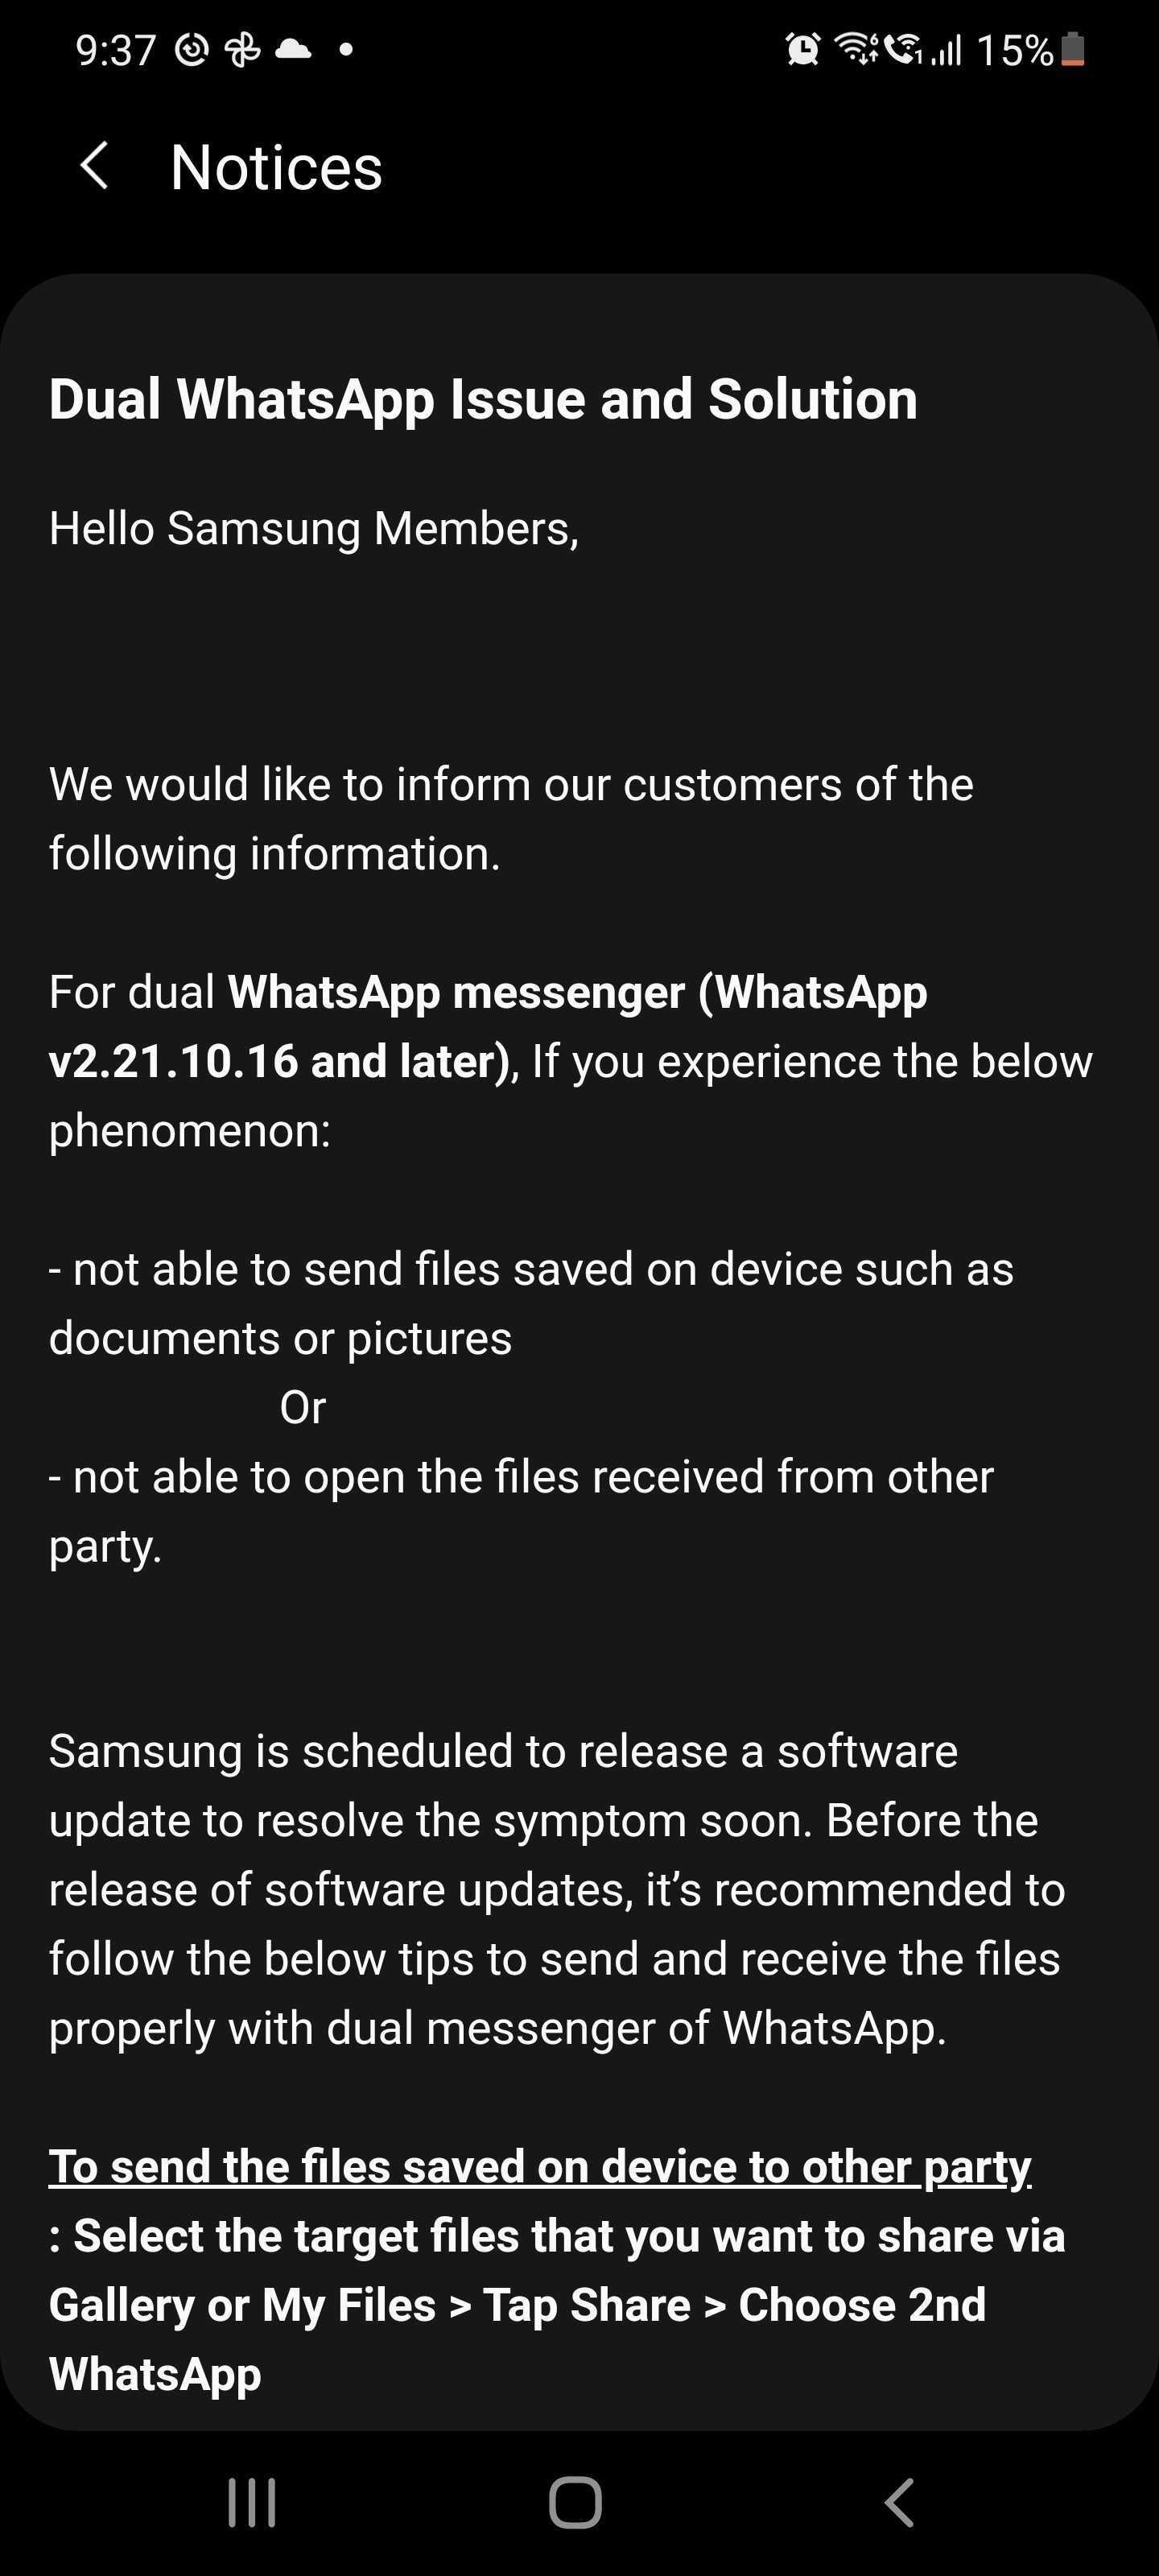 Samsung Dual Messenger WhatsApp File Sharing Issue